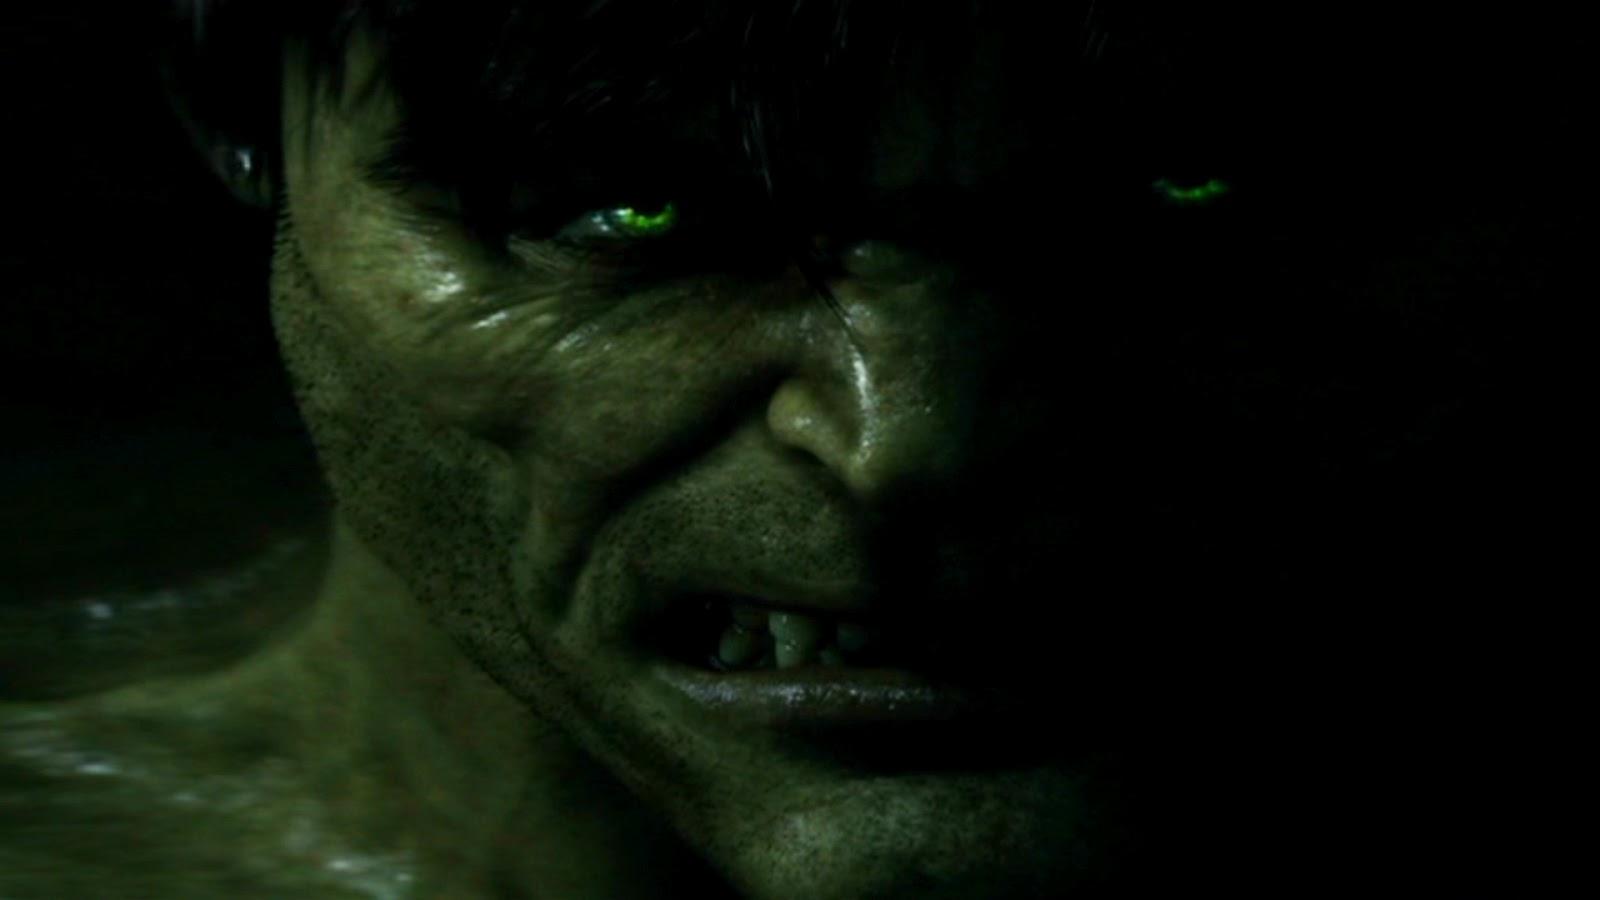 HD HulkWallpapers3 Hulk Wallpapers in Full HD 1080p wallpaper 1600x900